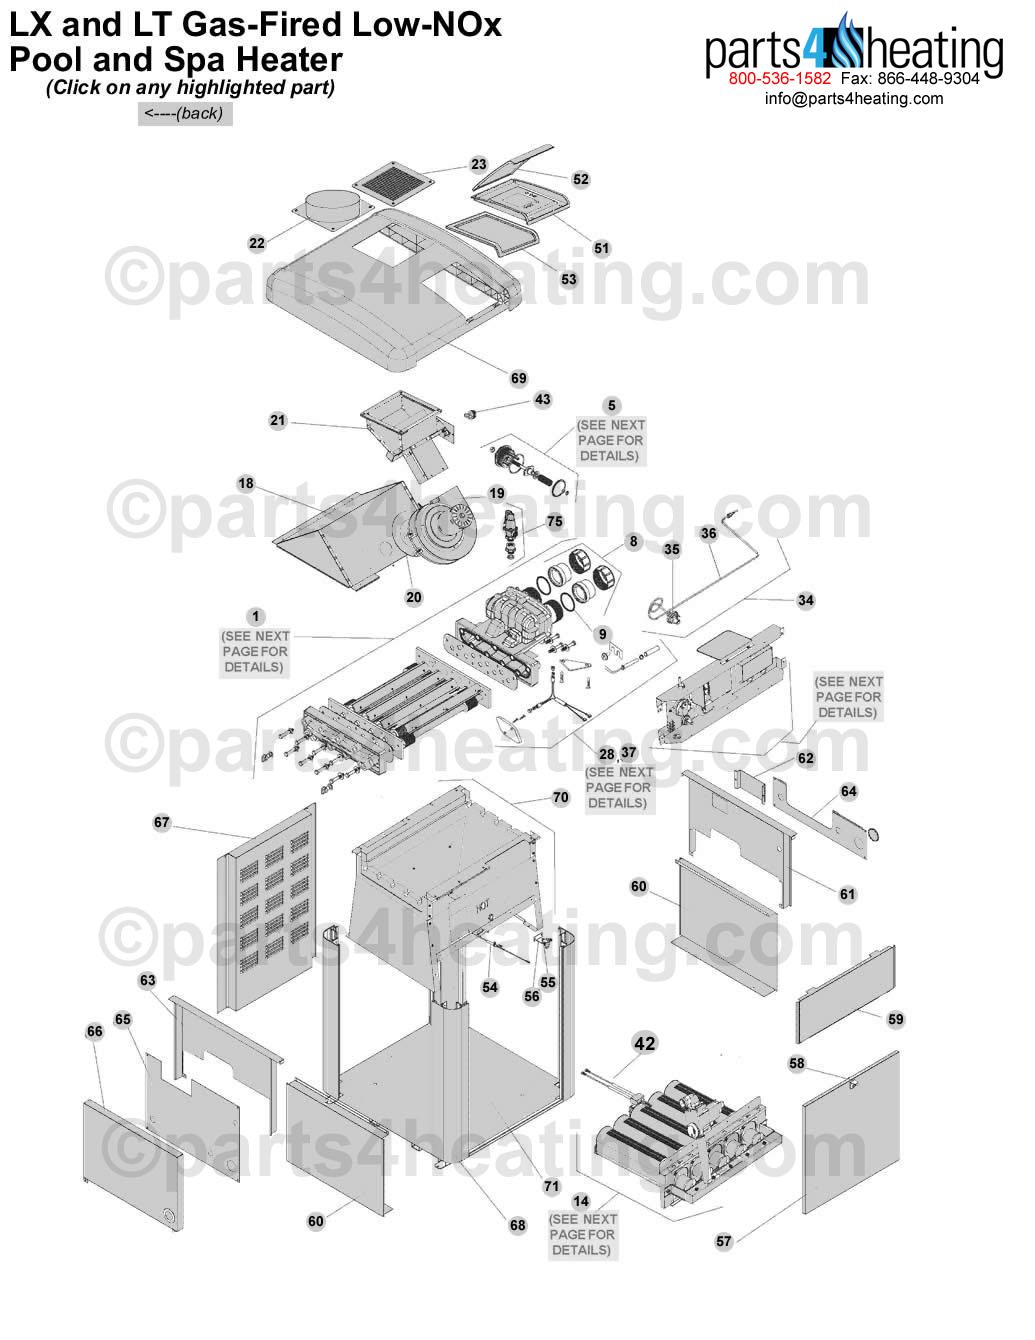 teledyne laars jandy ltlx nox gas heater clickable parts image. Black Bedroom Furniture Sets. Home Design Ideas